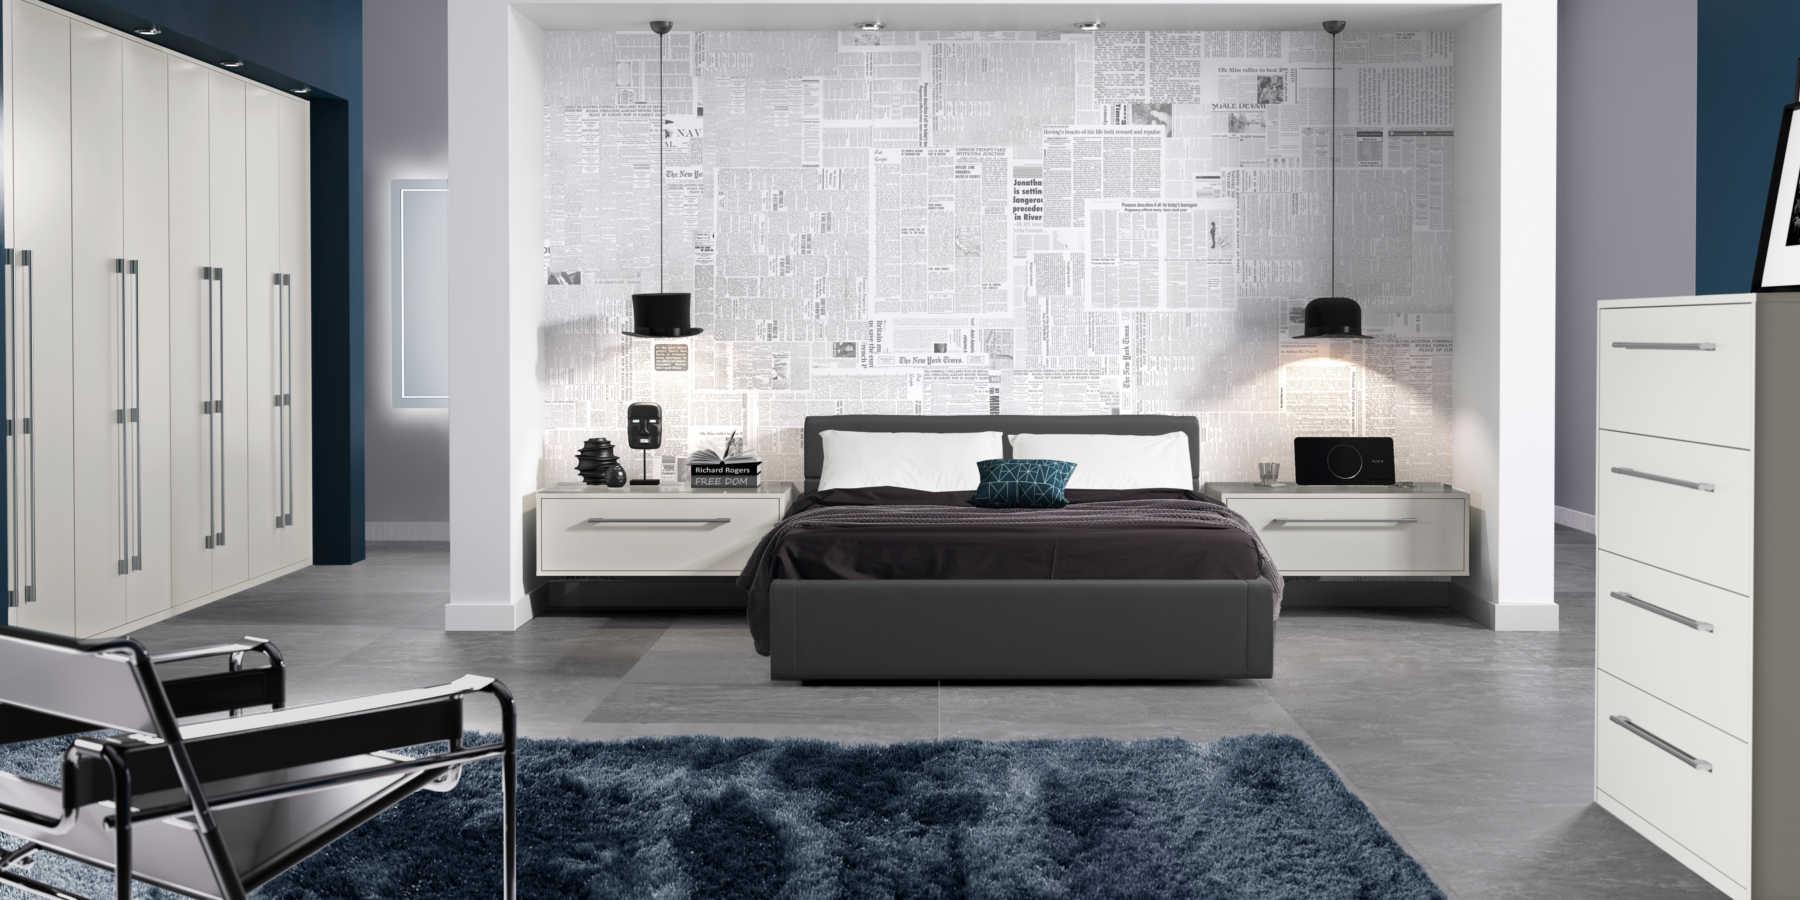 Symphony lunar bedroom